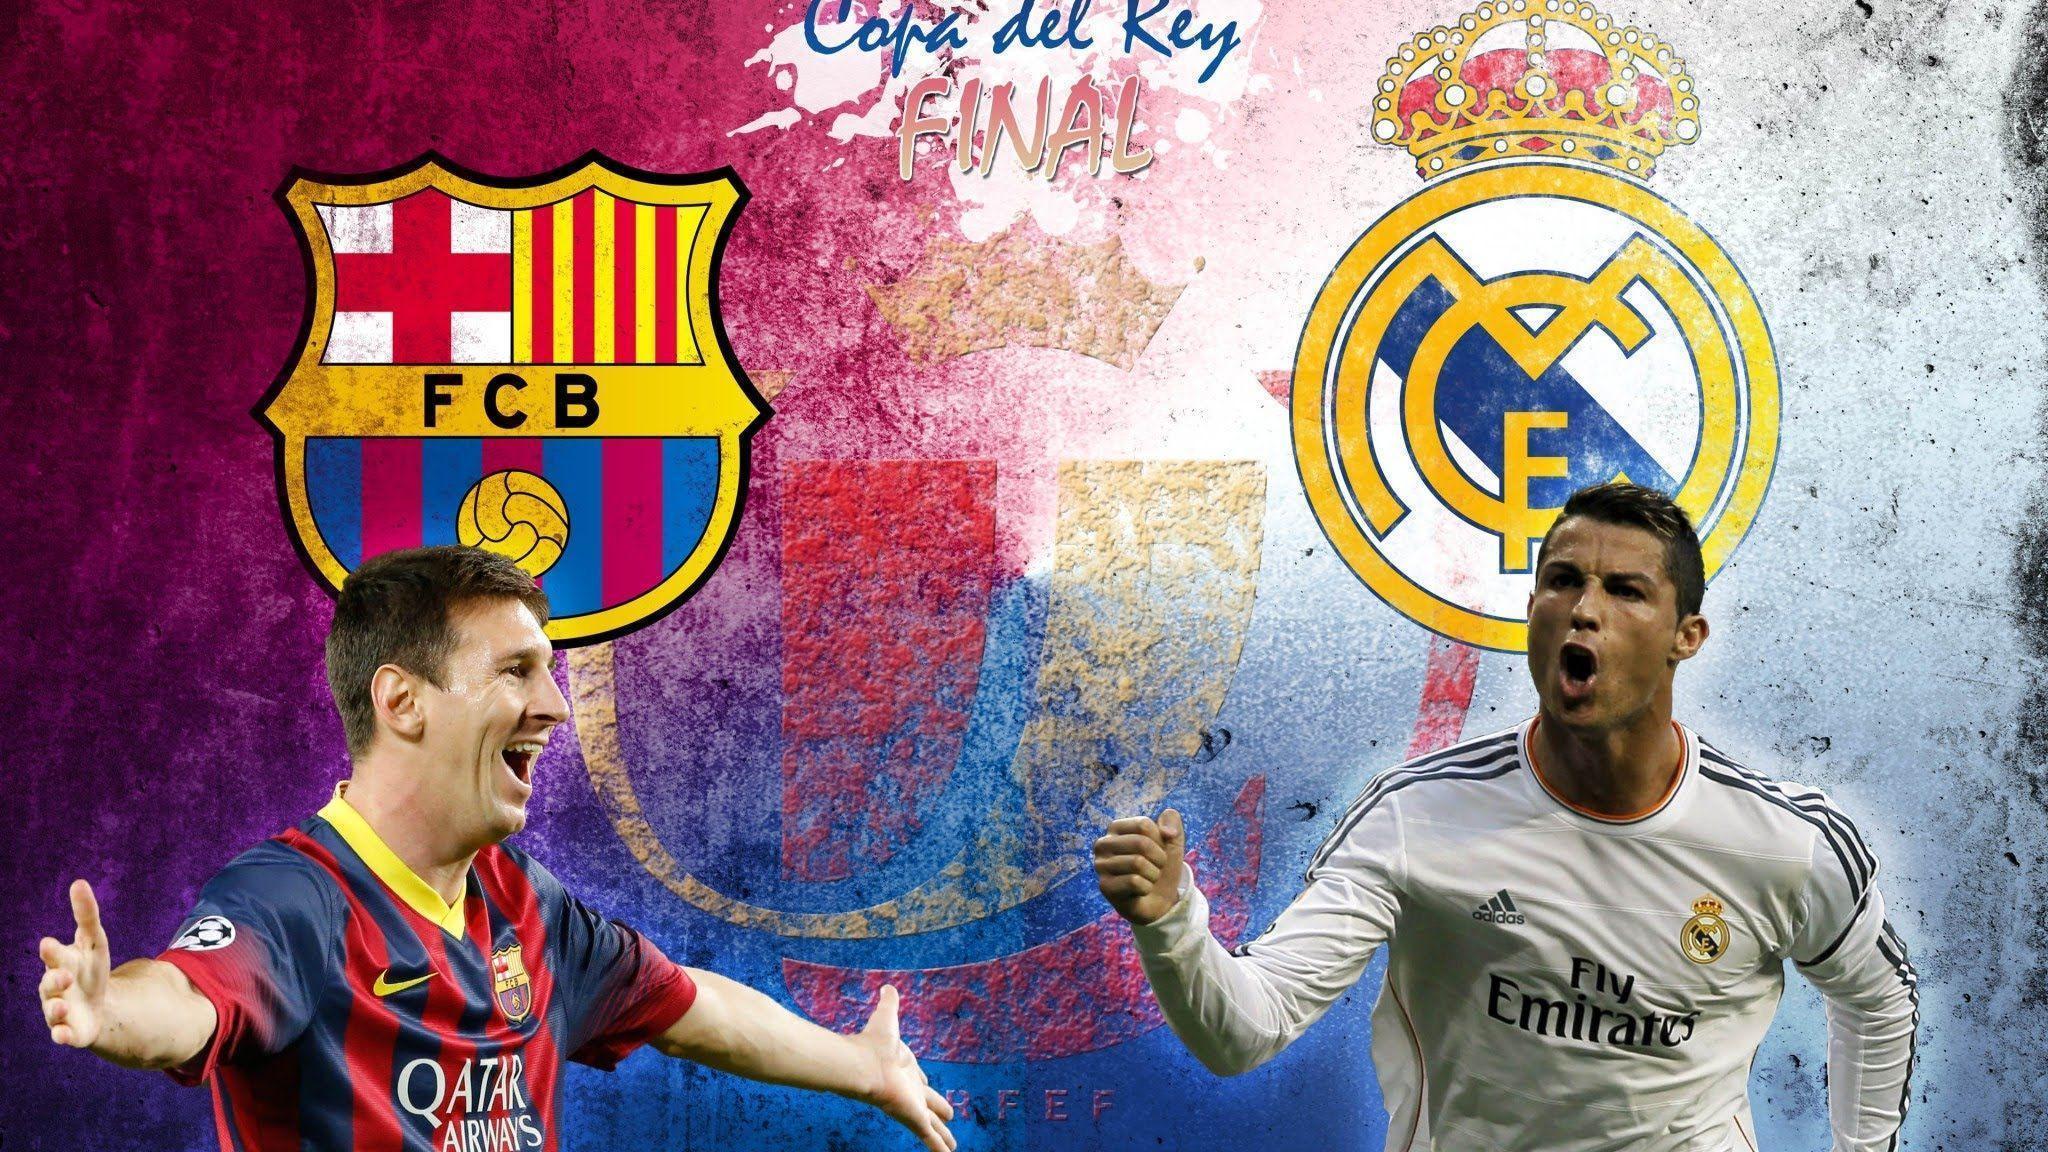 Real Madrid Vs Barcelona Goals 2014